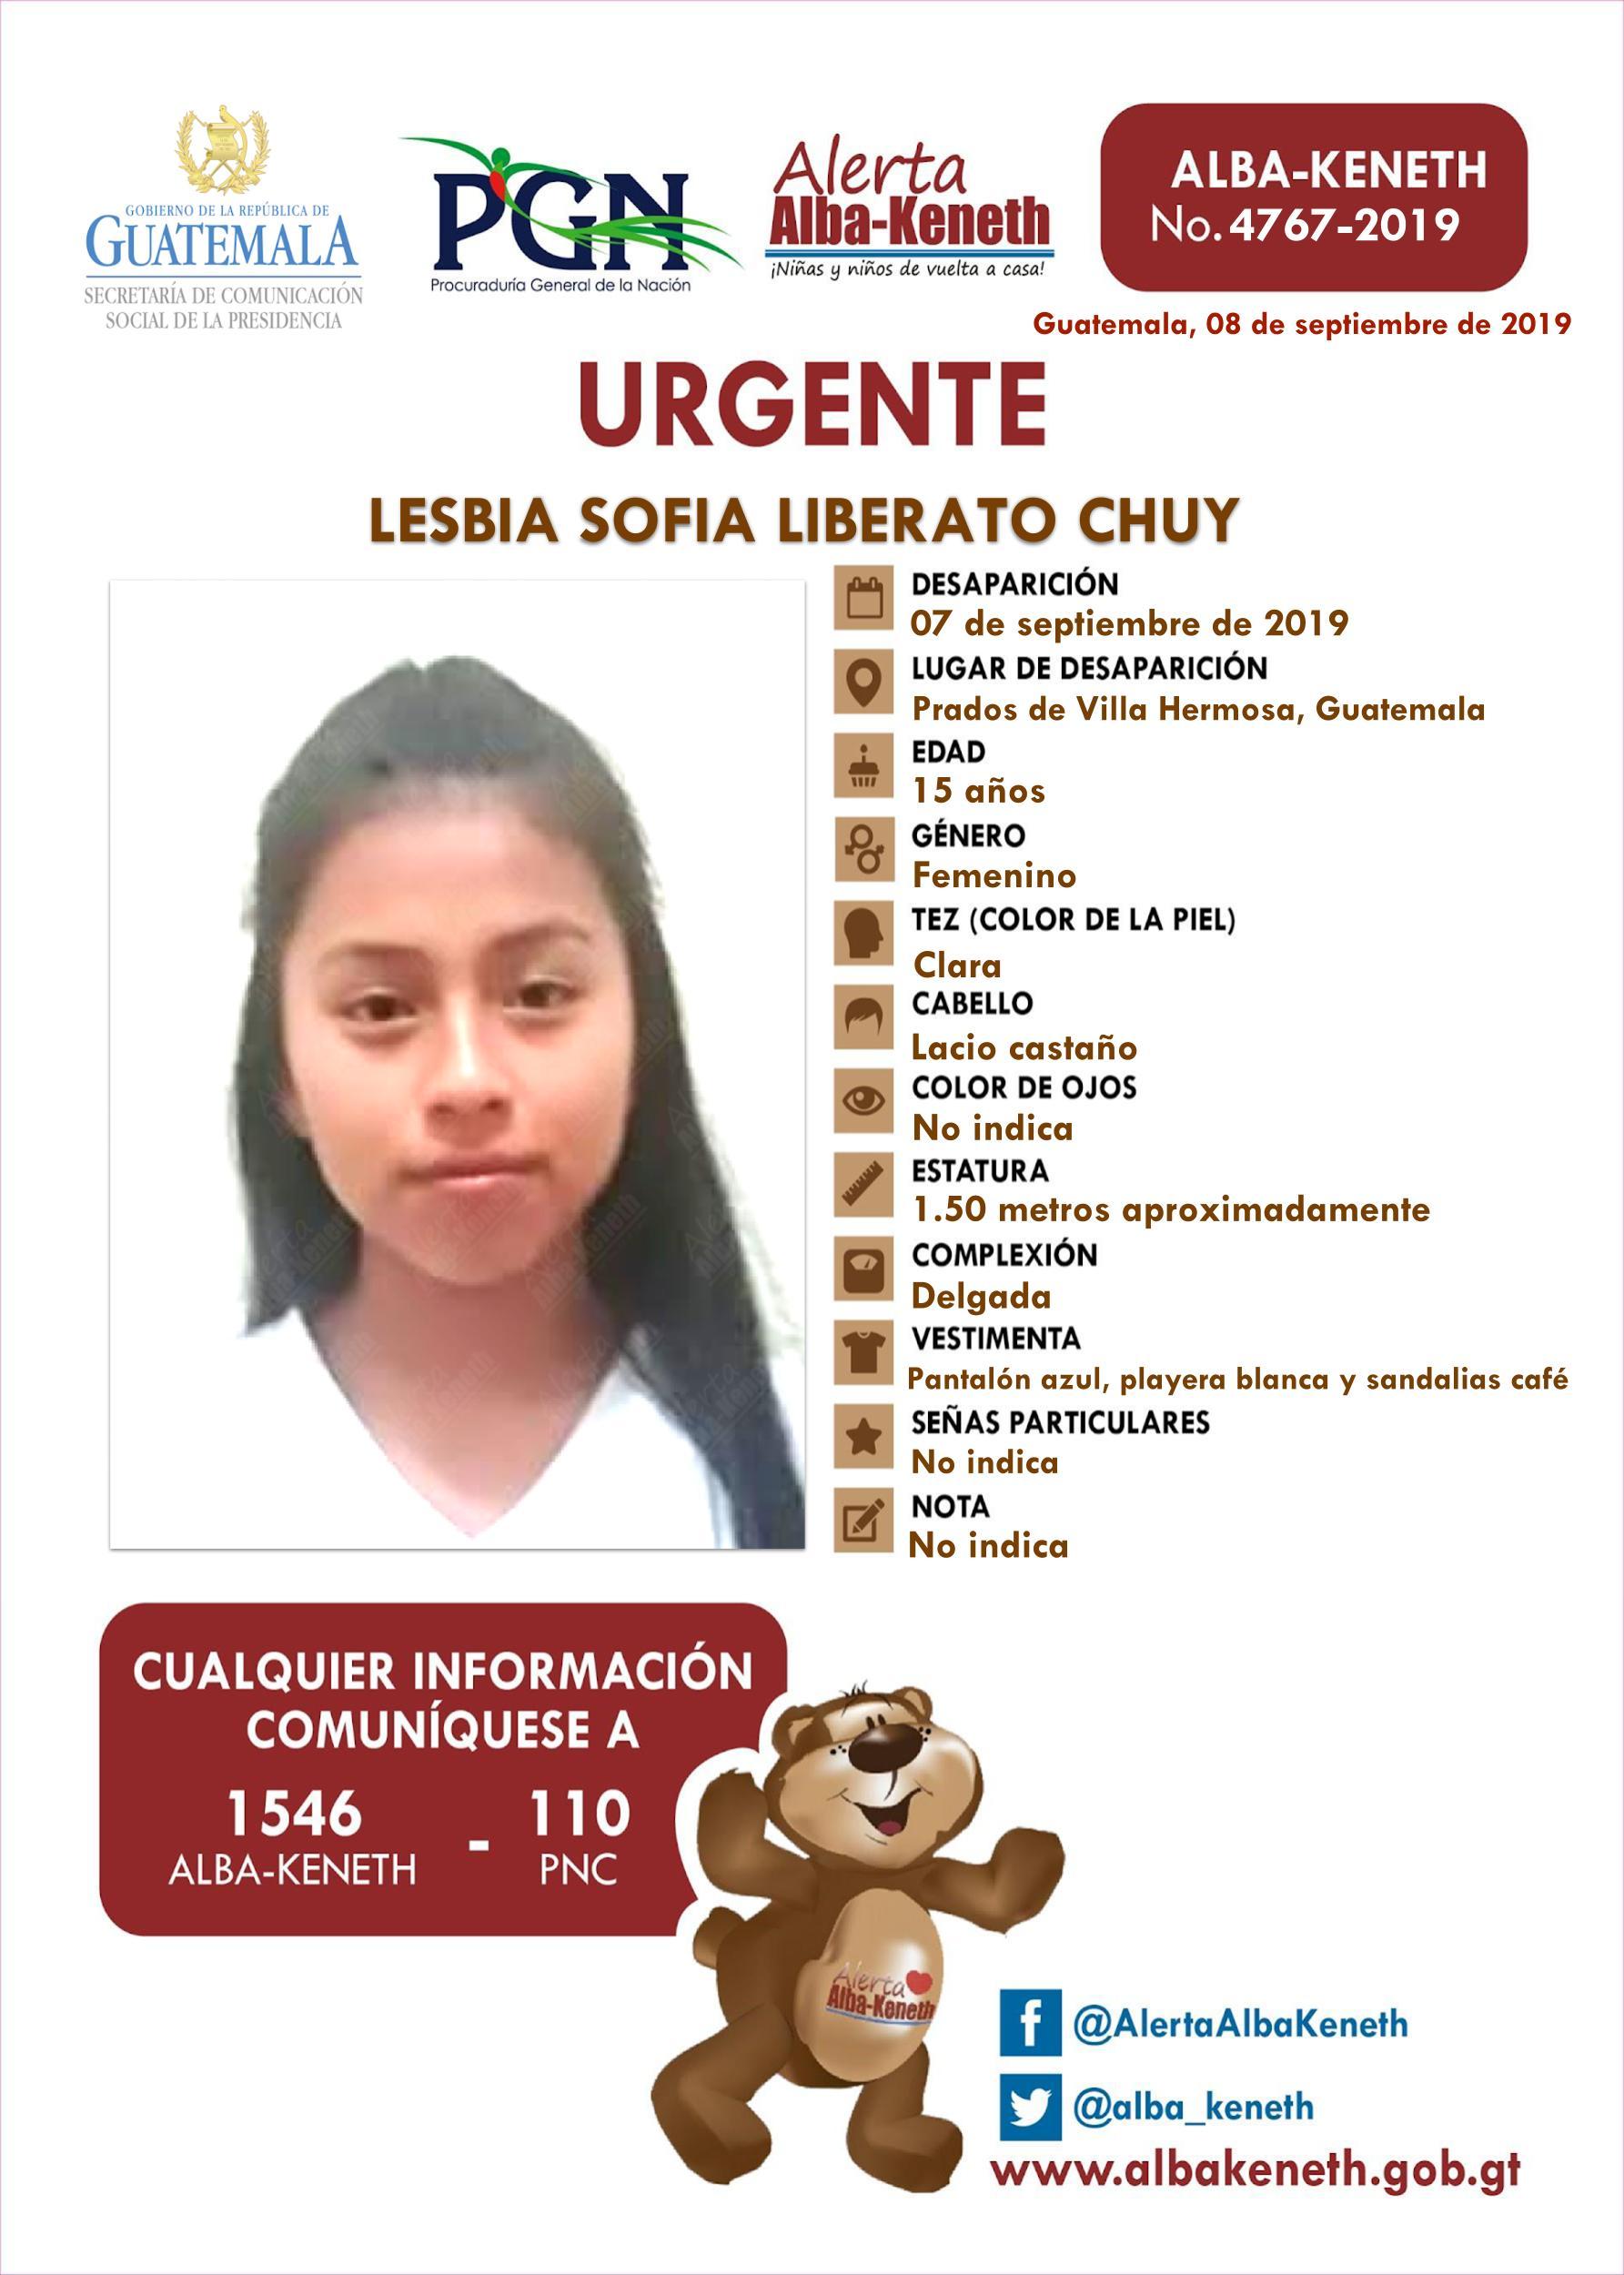 Lesbia Sofia Liberato Chuy